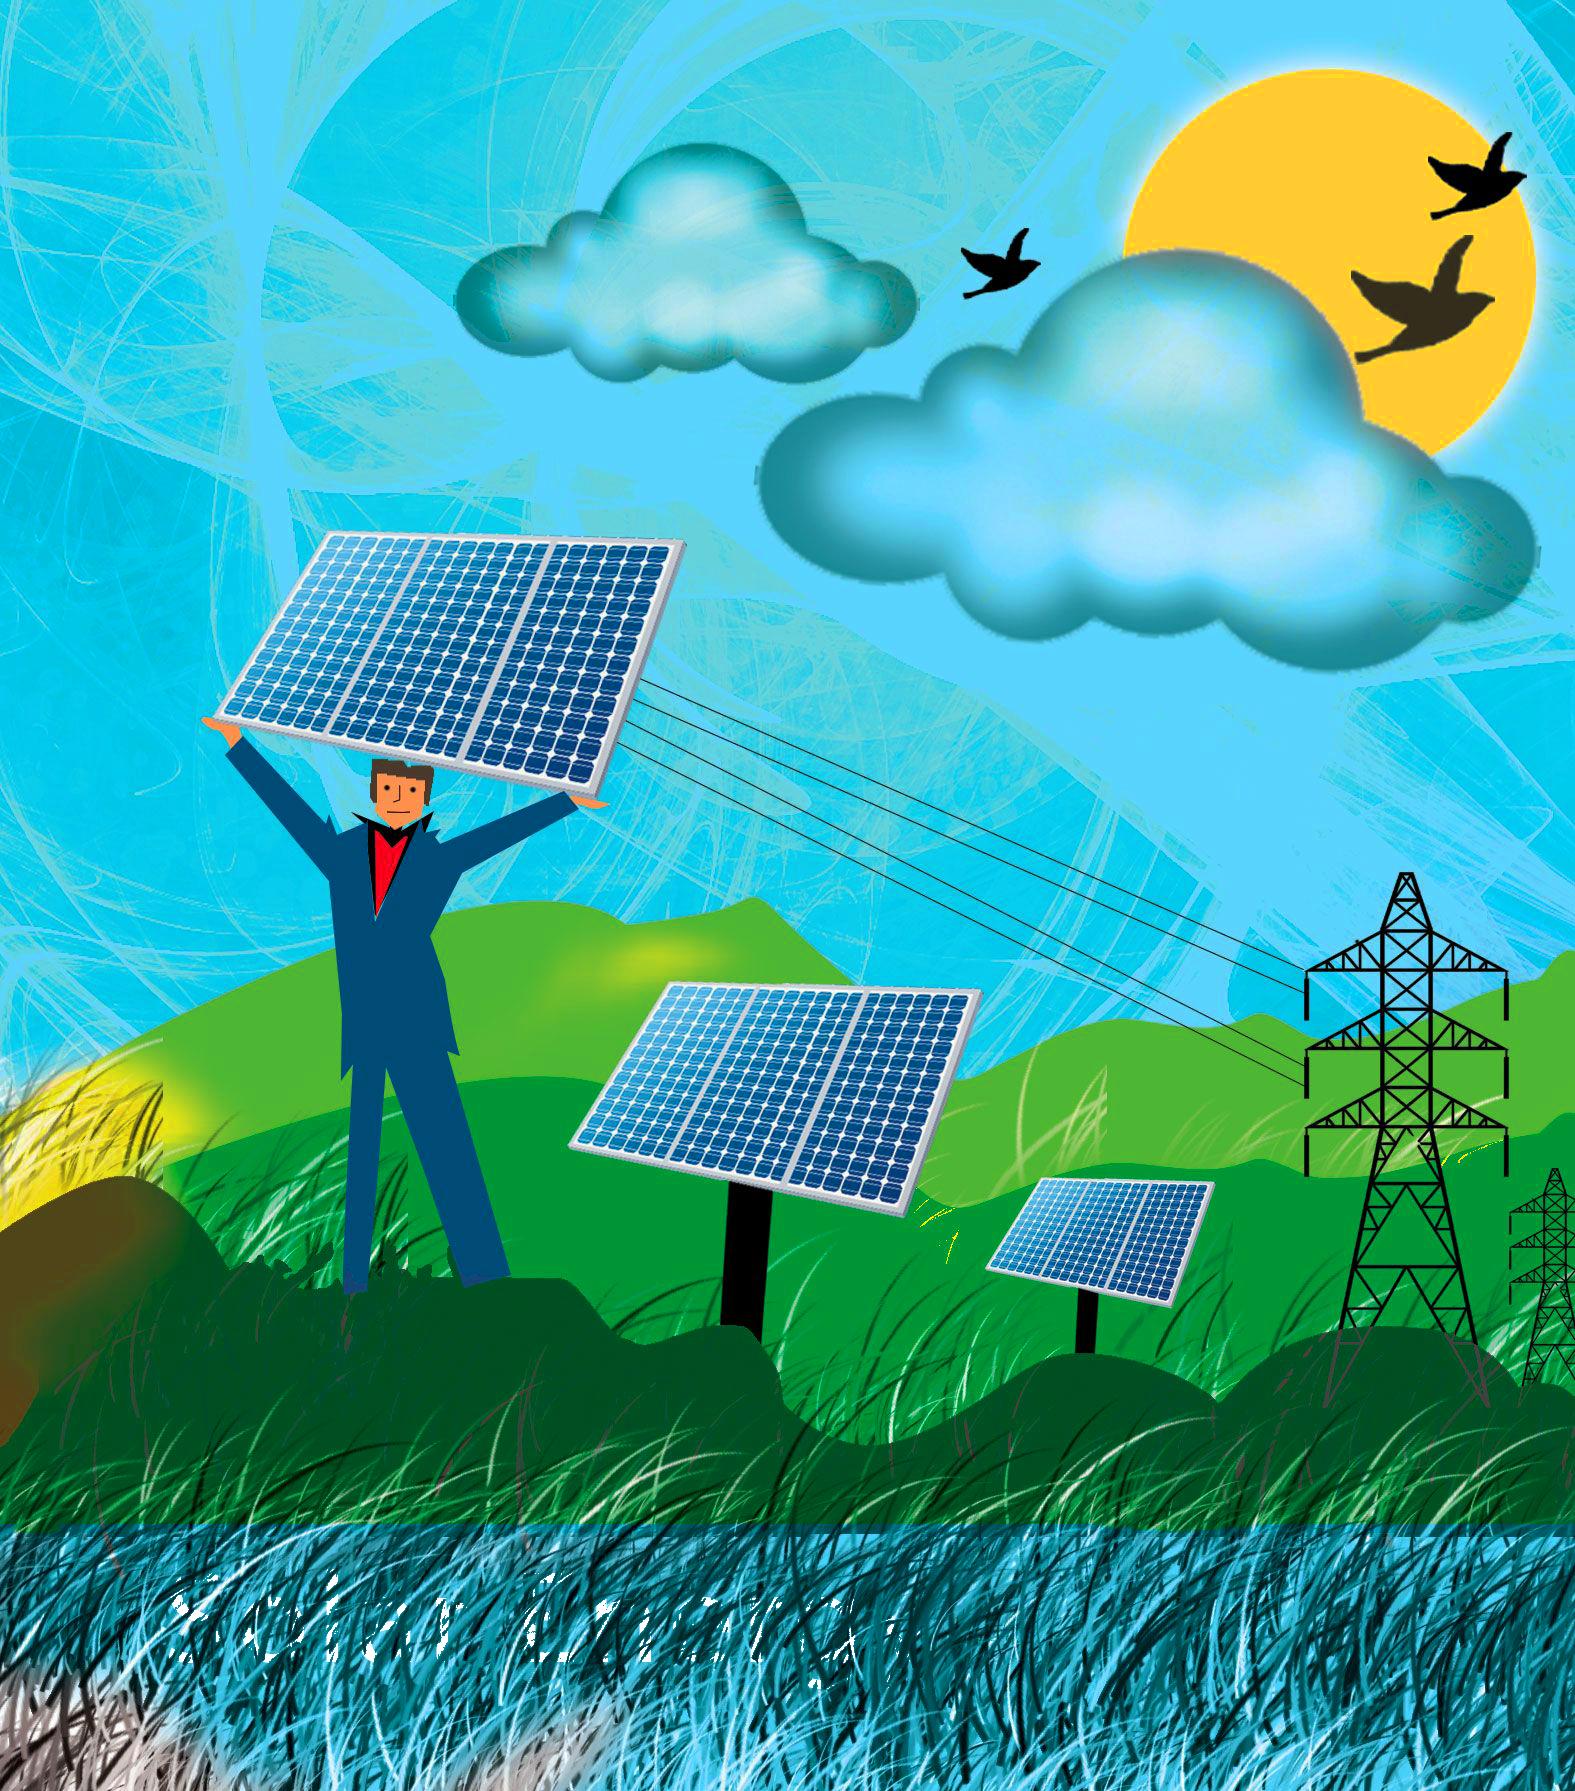 Solar Panels Your Home Solar Energy Diy Solar Projects Solar Energy Panels